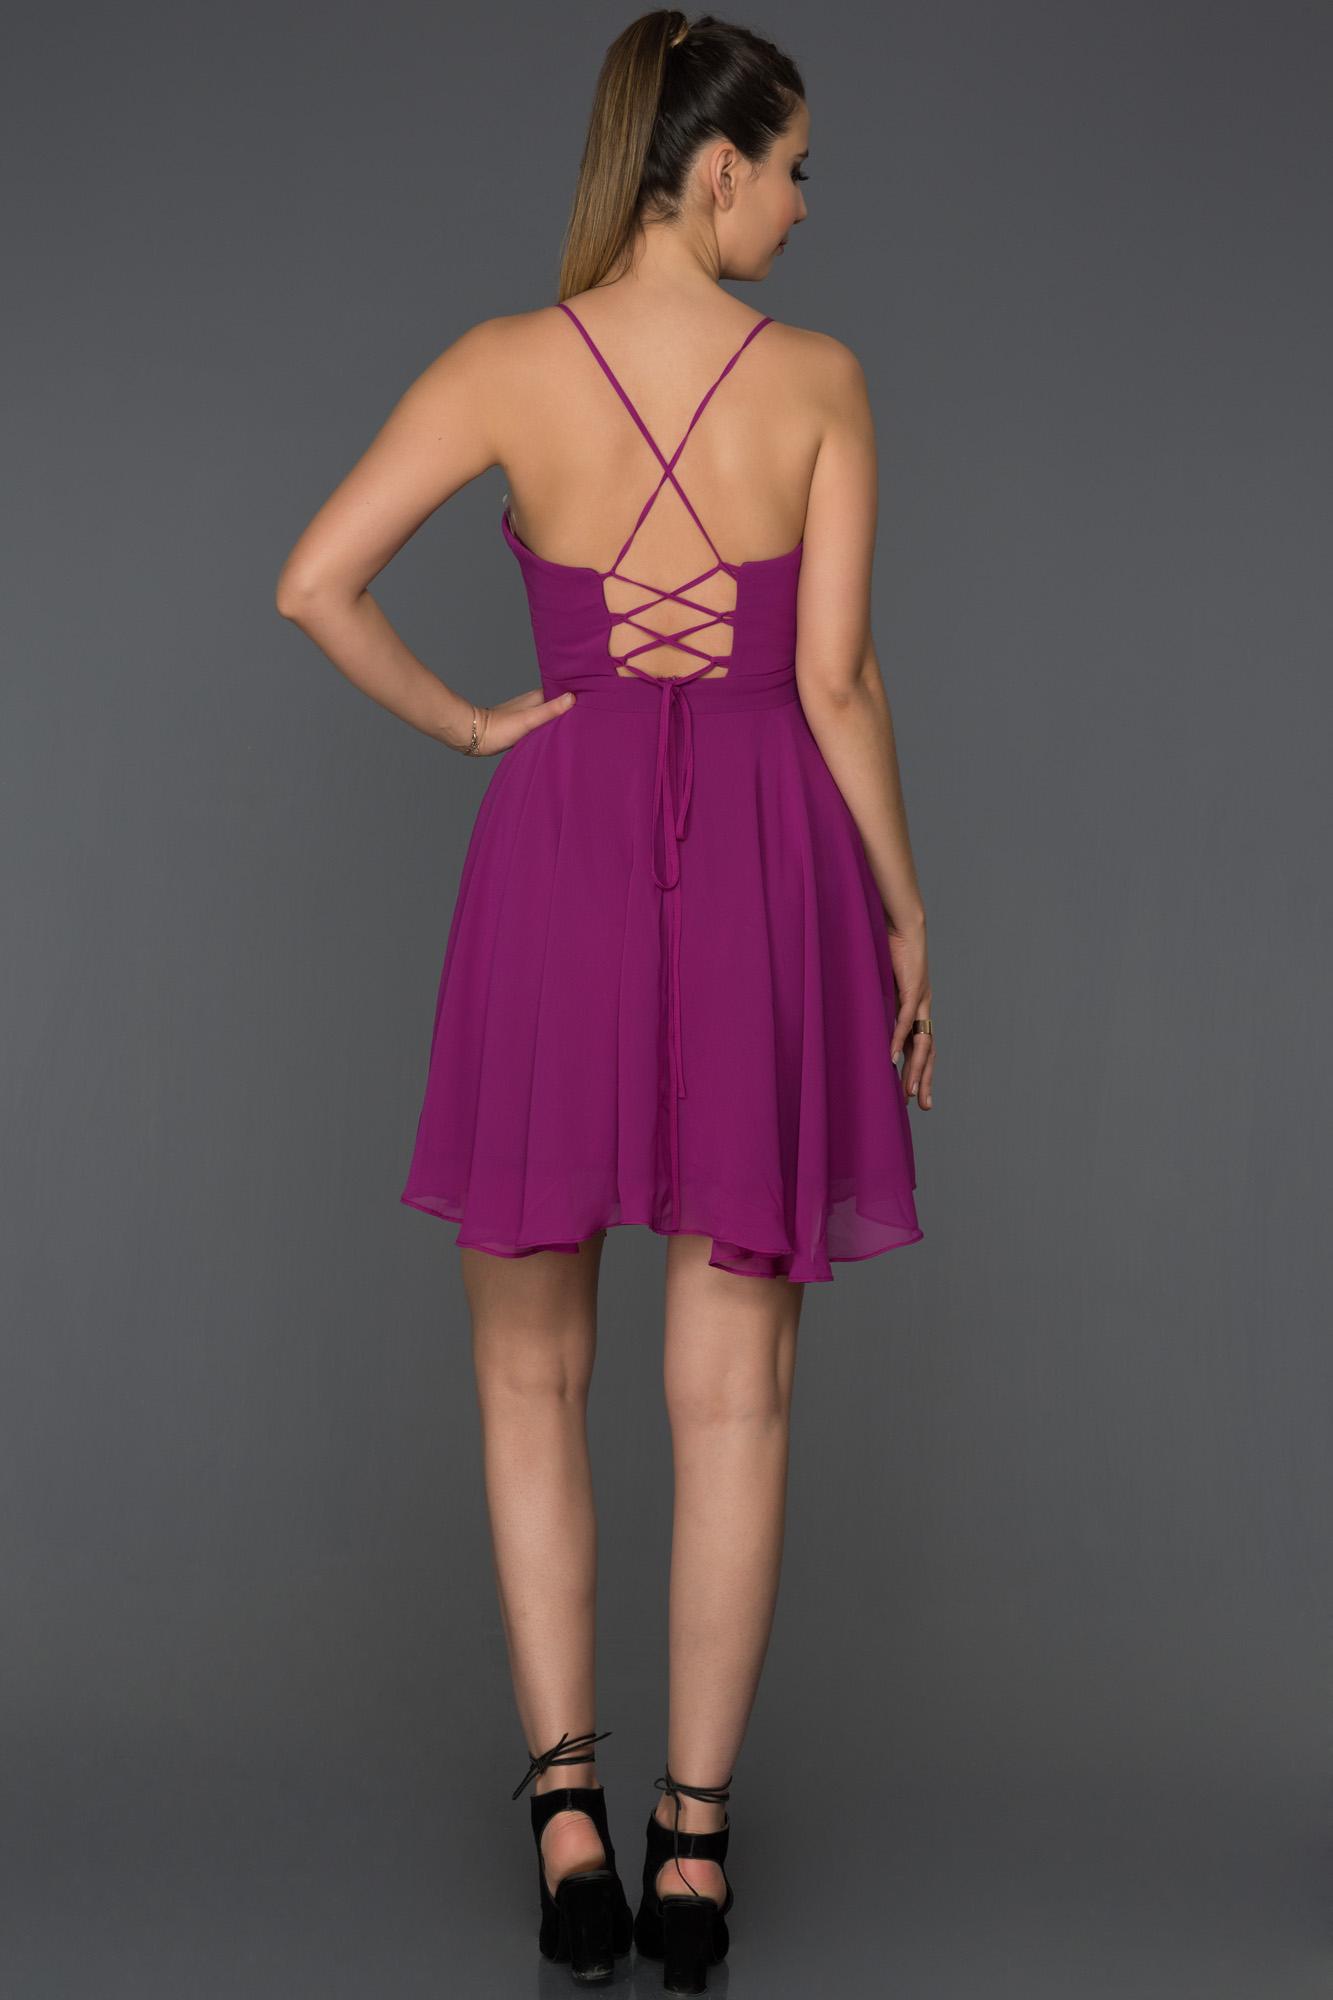 Mor Sırt Dekolteli Şifon Elbise